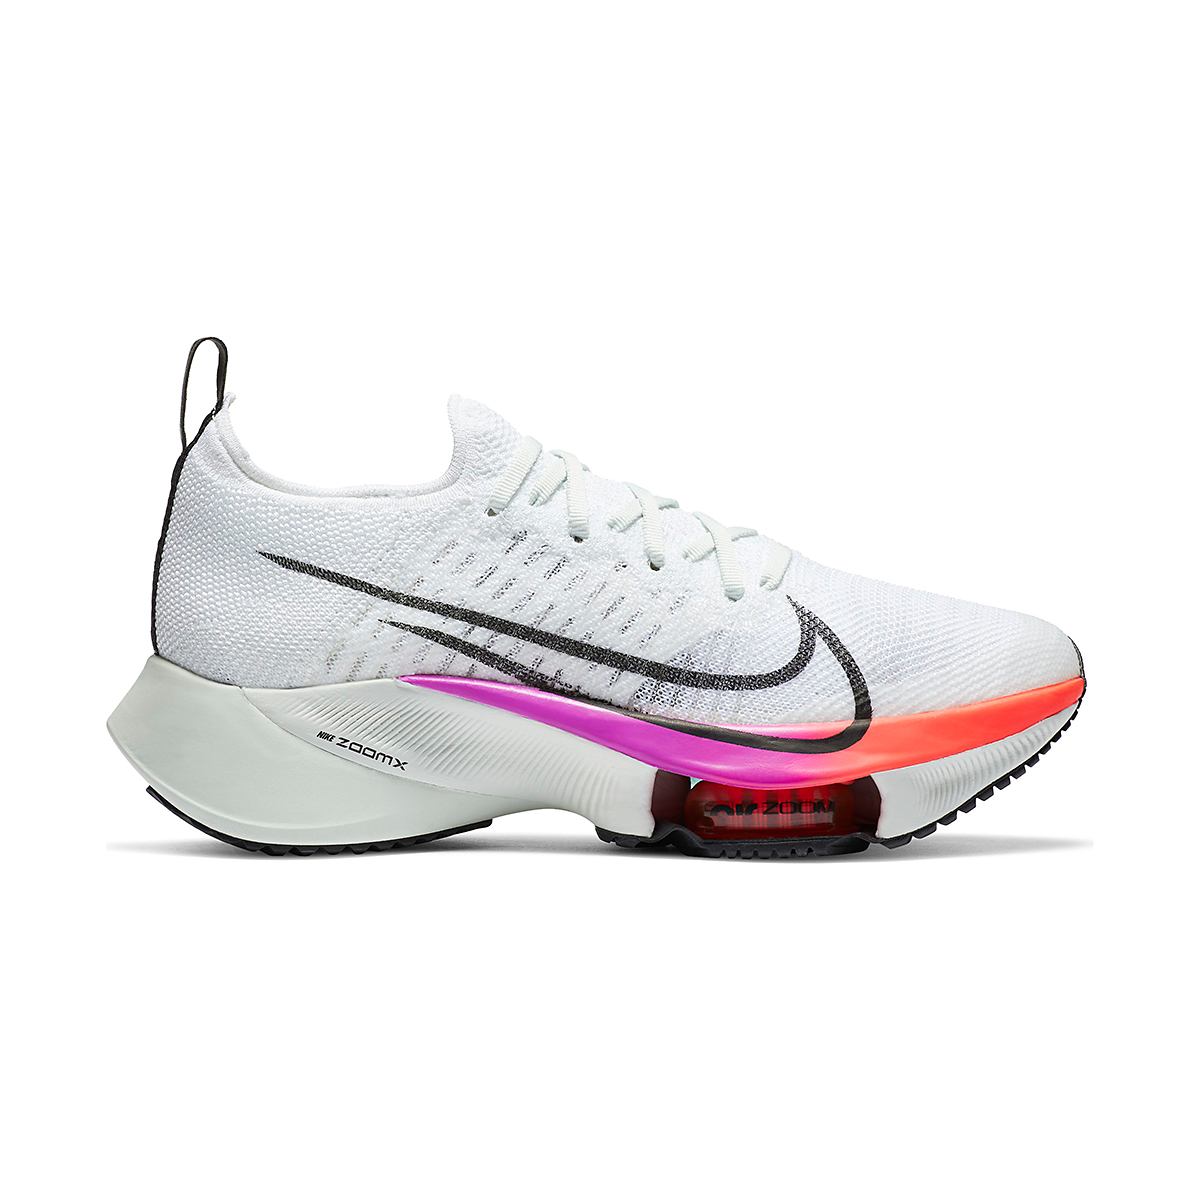 Women's Nike Air Zoom Tempo NEXT% Running Shoe - Color: White/Black-Hyper Violet-Flash Crimson - Size: 5 - Width: Regular, White/Black-Hyper Violet-Flash Crimson, large, image 1